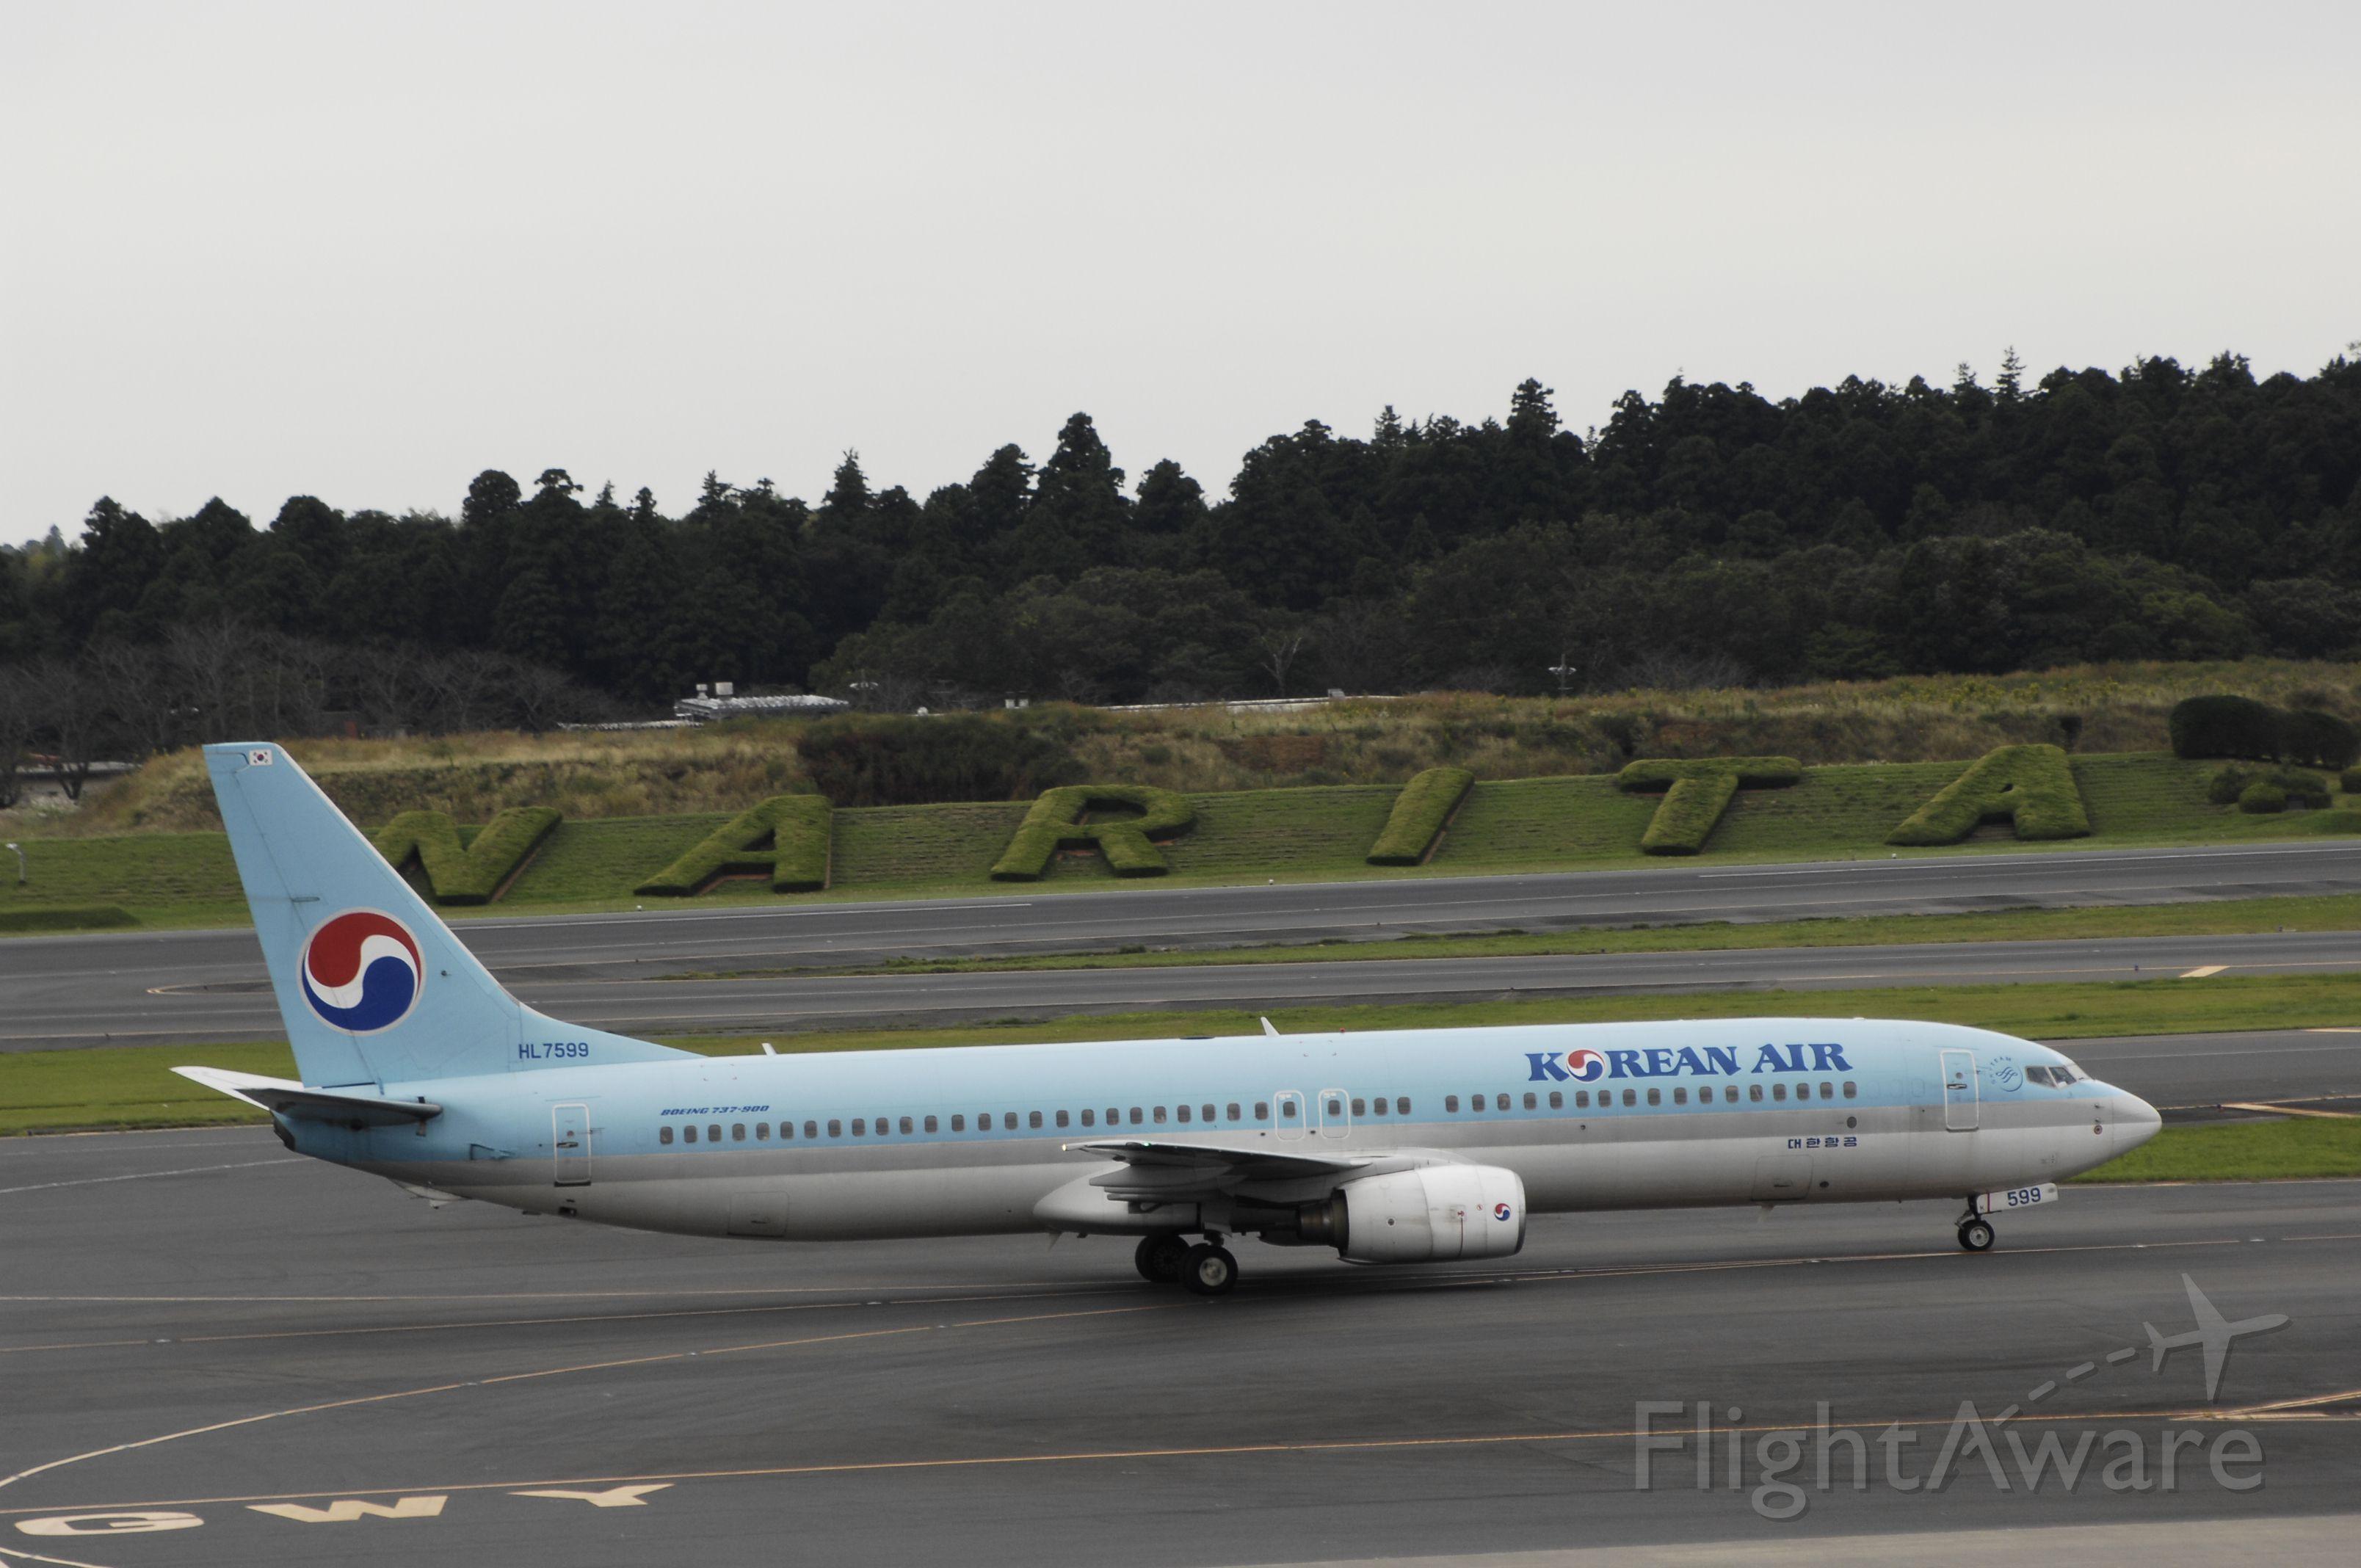 Boeing 737-900 (HL7599) - Taxing at Narita Intl Airport on 2016/10/13